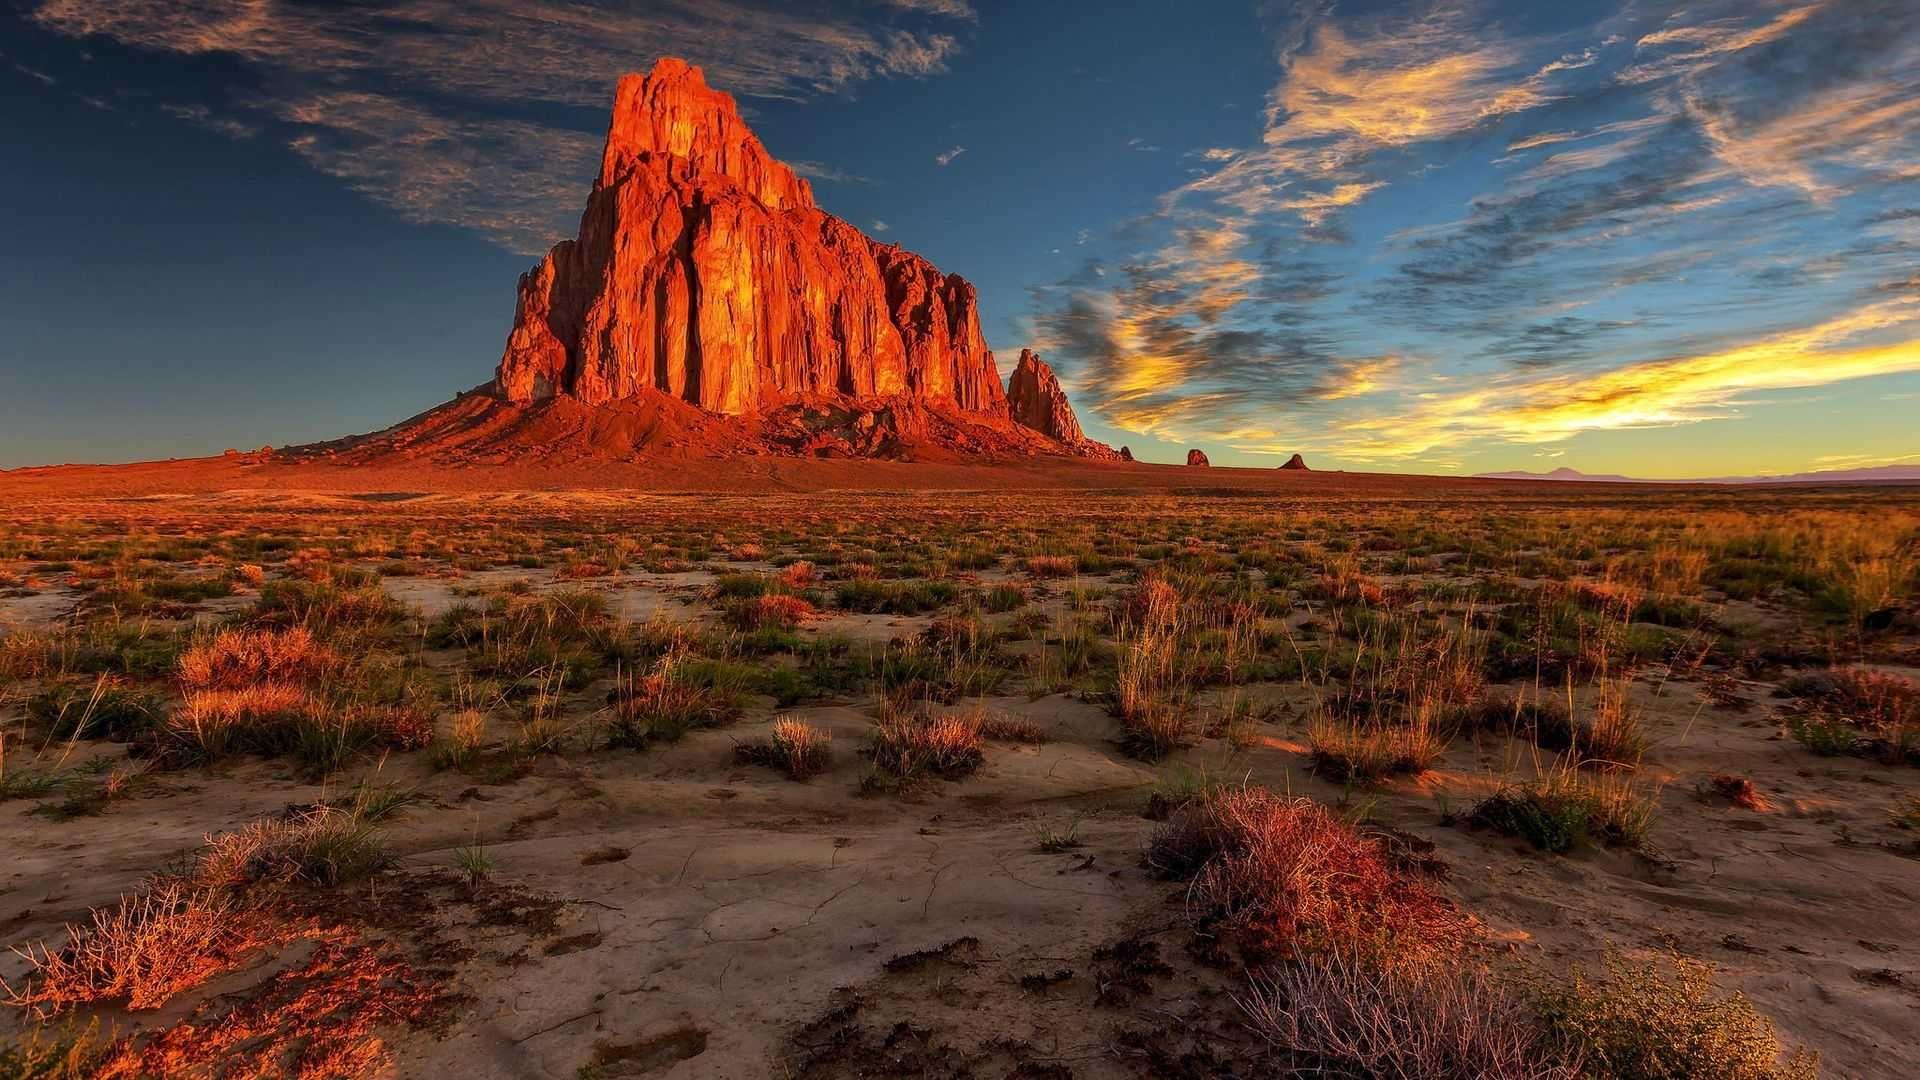 Desert Foothills Landscape 1080p